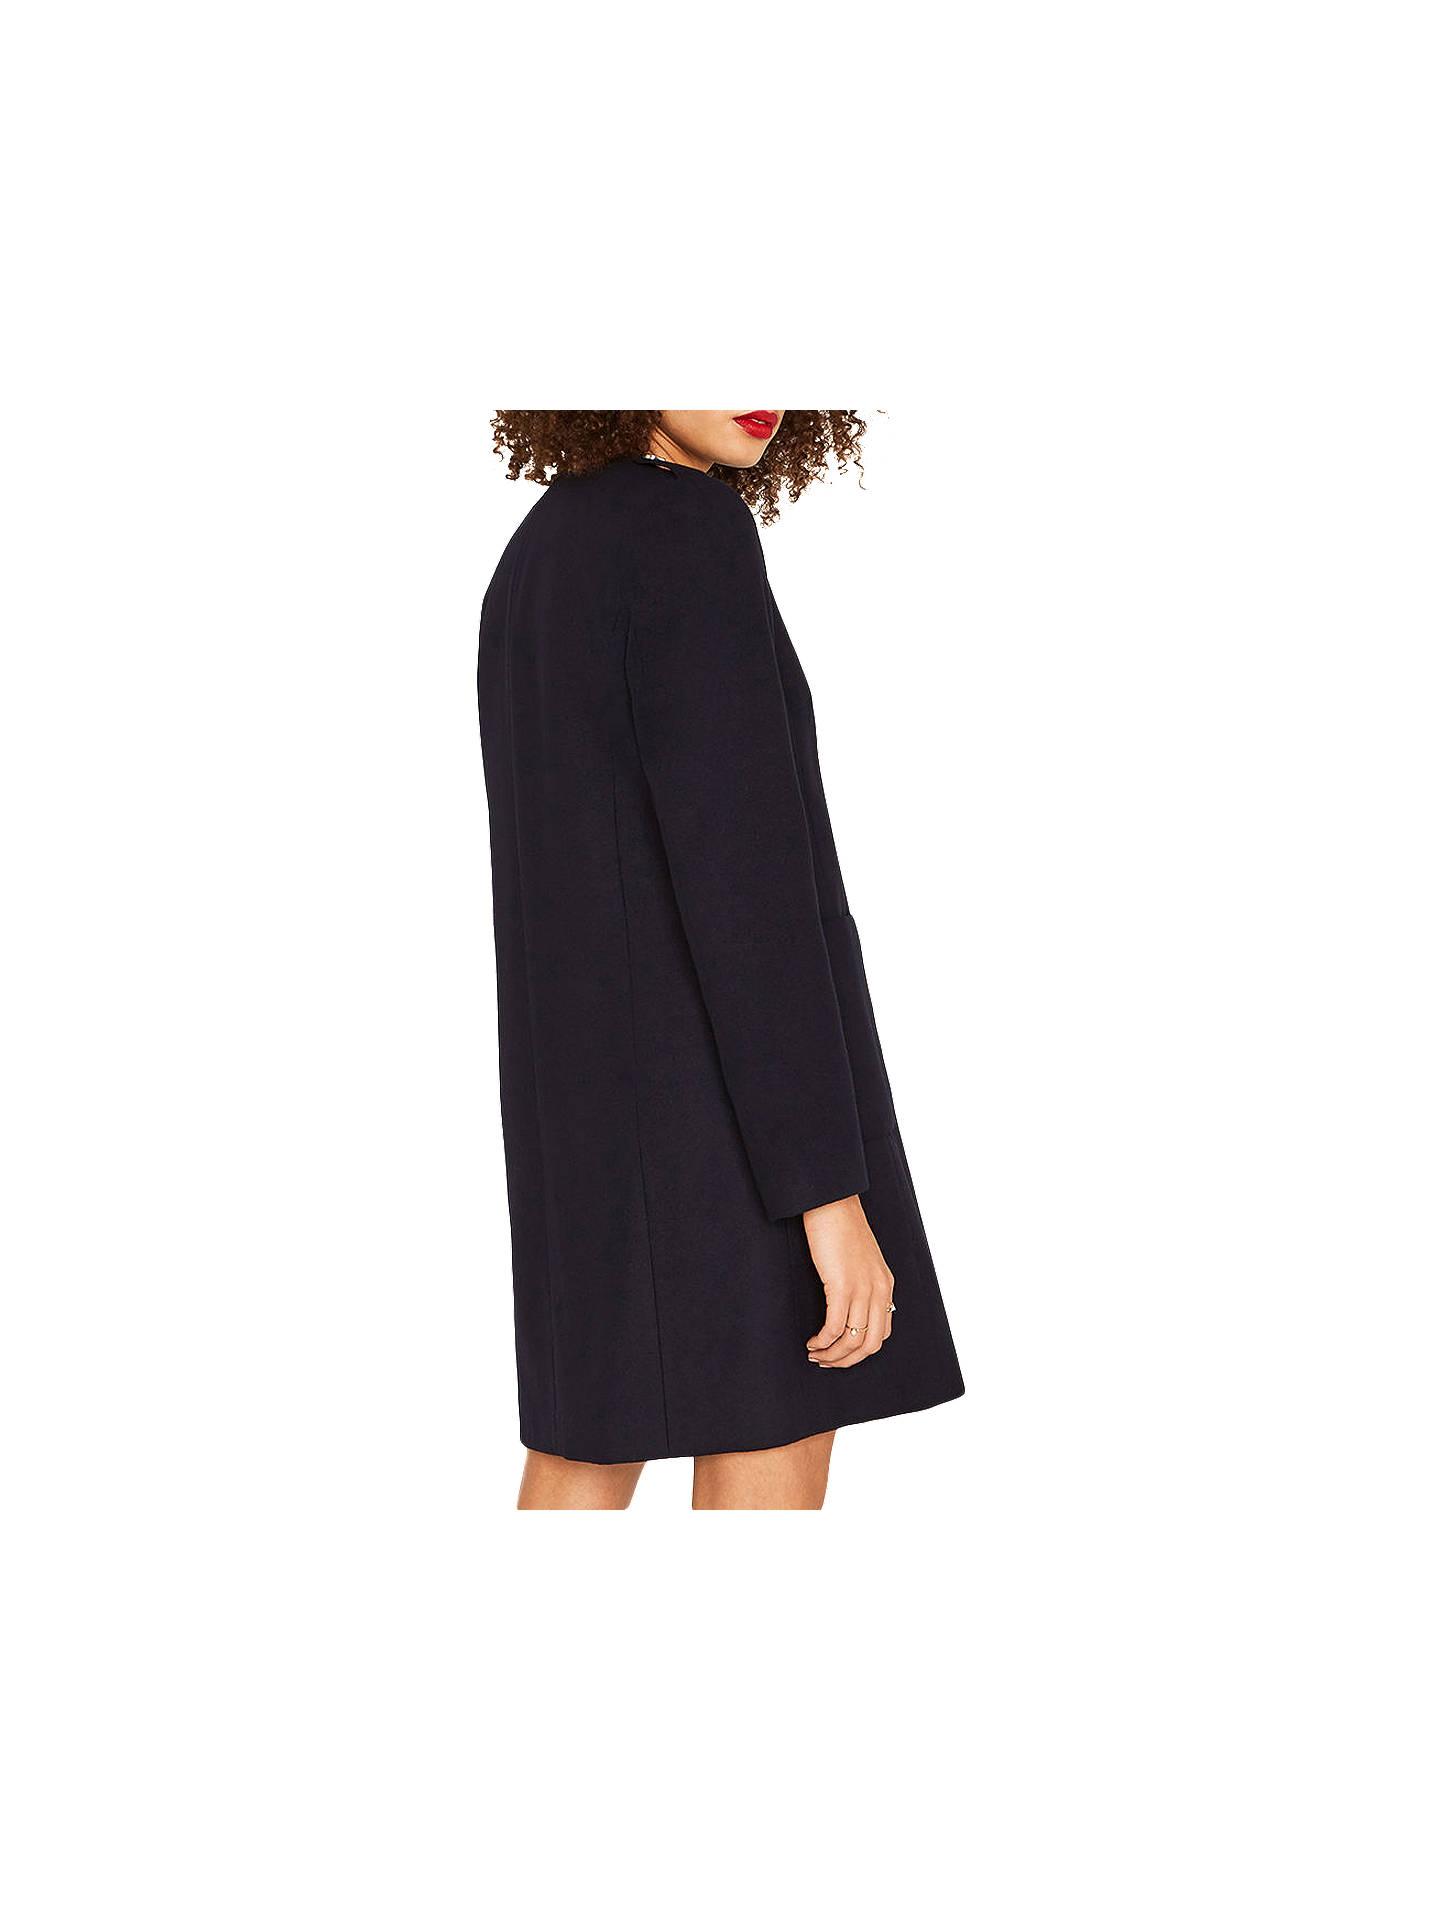 71ea393897d9 ... Buy Oasis Collarless Coat, Navy, XS Online at johnlewis.com ...